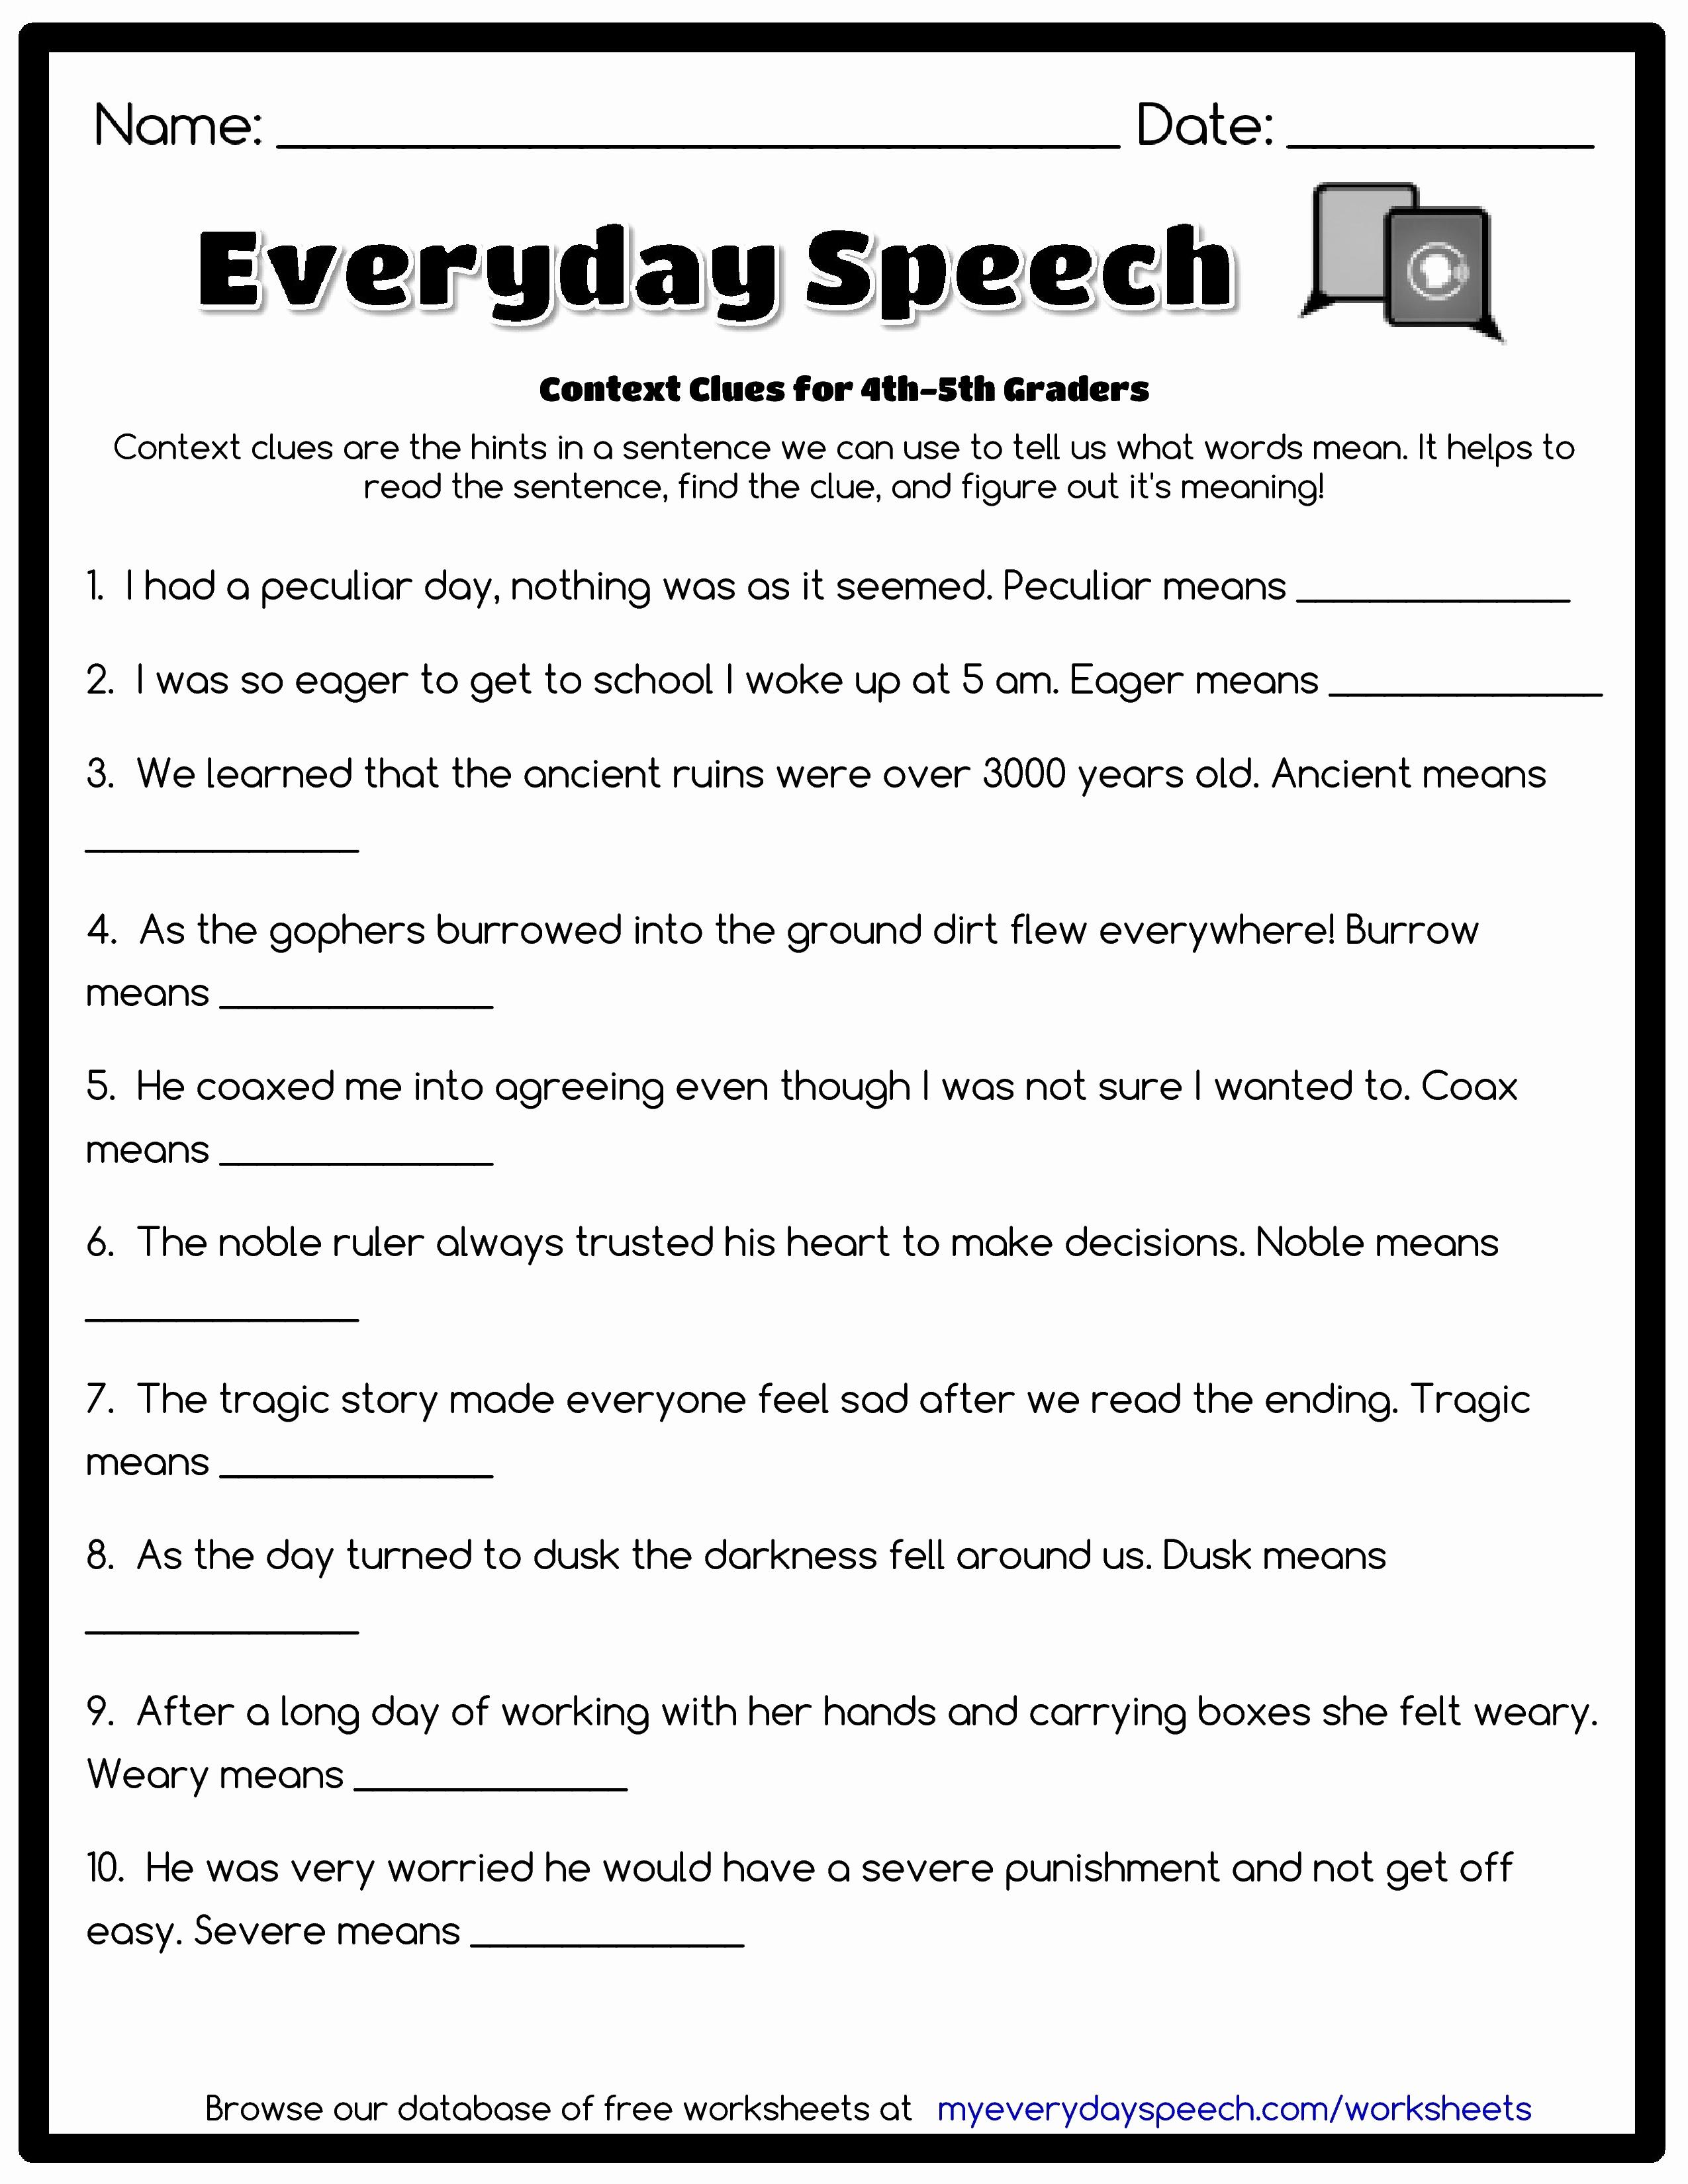 Grammar Worksheets Third Grade To Education - Math Worksheet For | Printable Grammar Worksheets